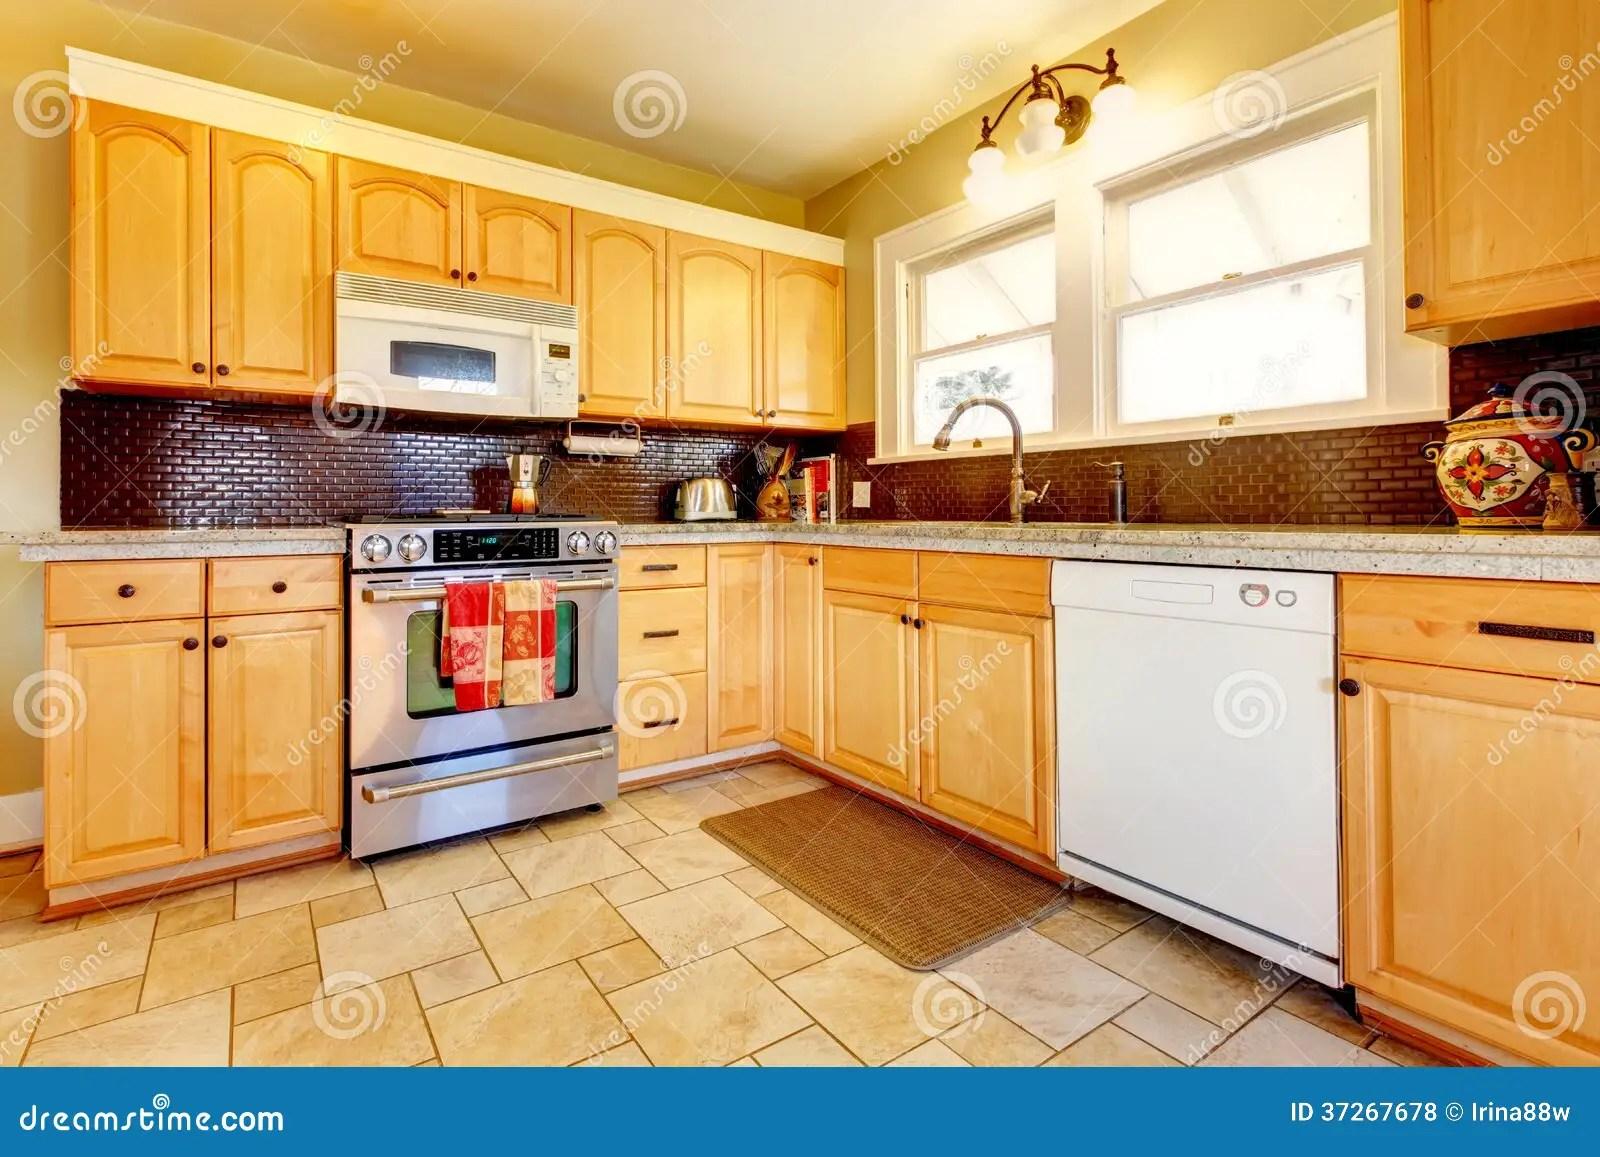 yellow kitchen rugs table and chair set 有砖backsplash设计的光口气木厨房库存照片 图片包括有装备 拱道 任何 有木内阁和黑褐色backsplash的黄色厨房设计 砖地和小地毯